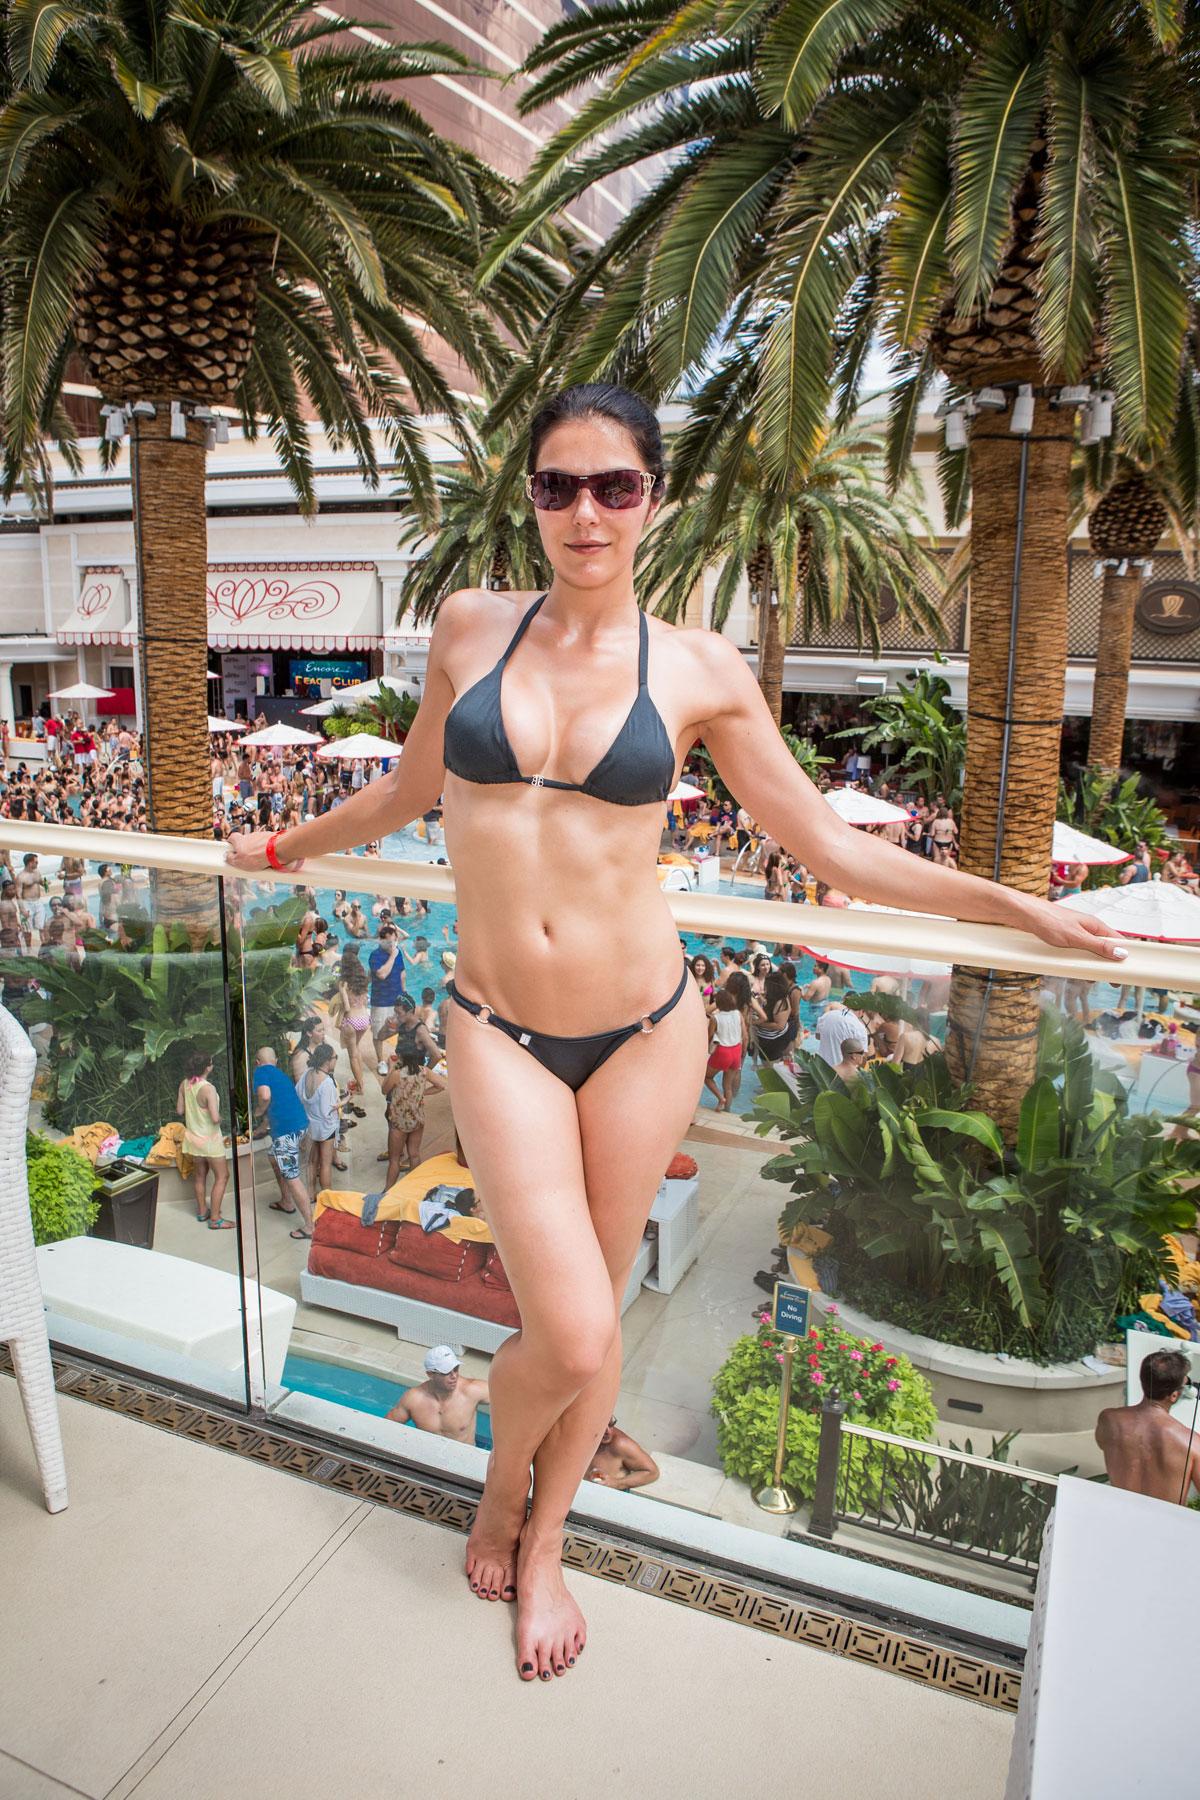 Bikini beach club houston